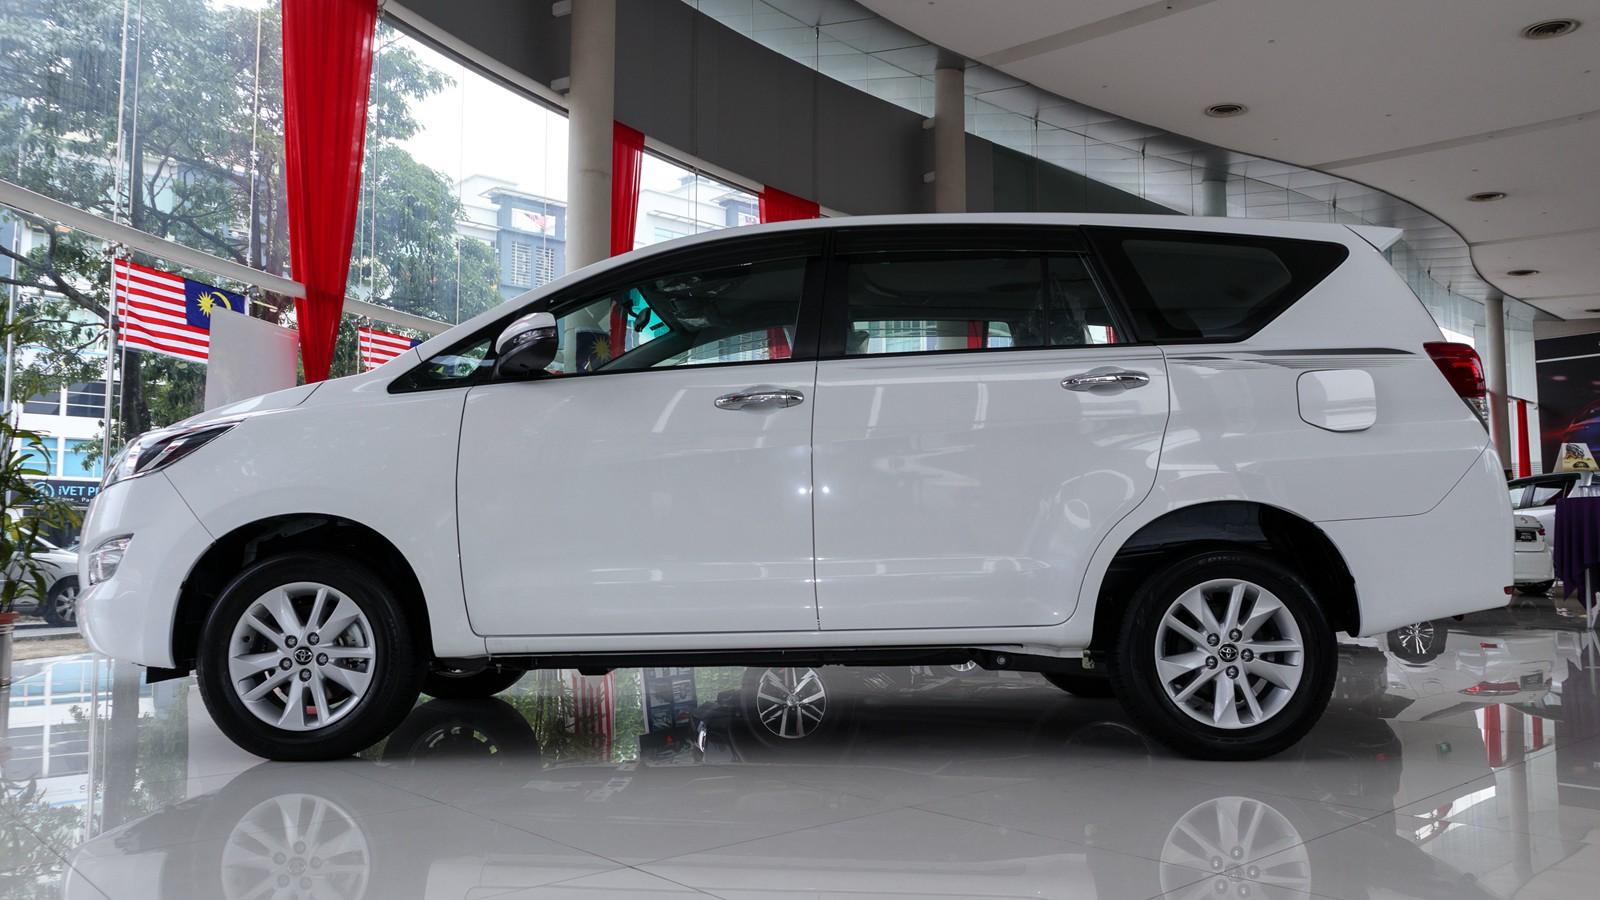 Kelebihan Harga Toyota Innova Murah Berkualitas